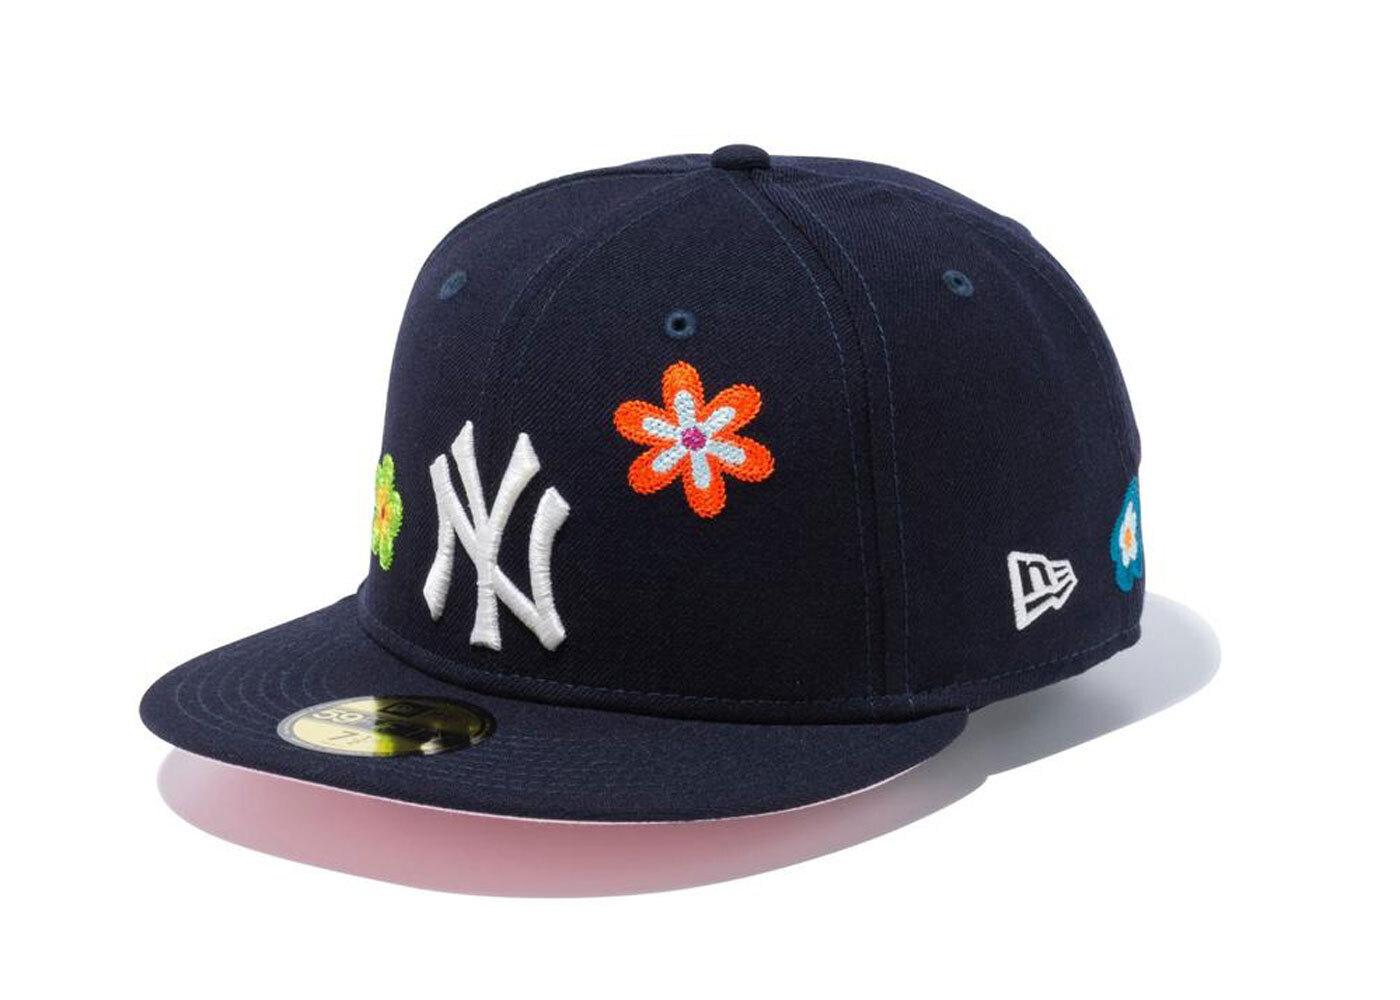 New Era 59FIFTY Chain Stitch Floral New York Yankees Pink Under Visor Navyの写真